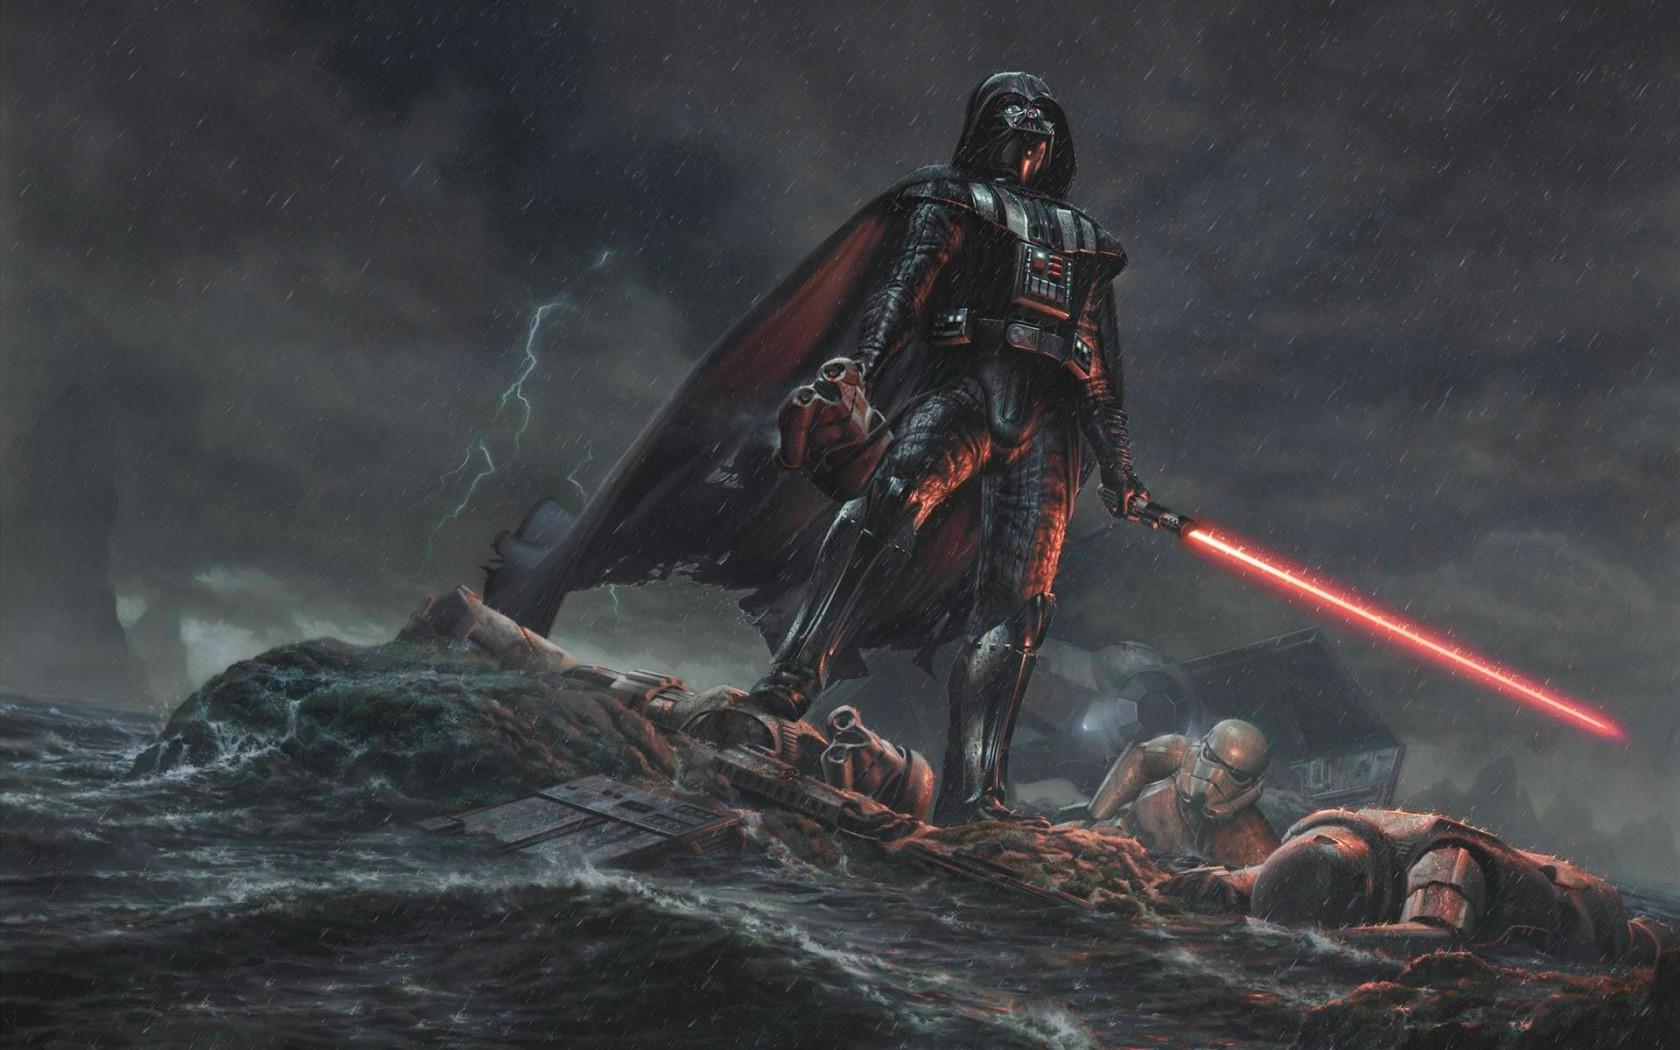 Star Wars Artwork Science Fiction Darth Vader Darkness Screenshot 1680x1050 Px Computer Wallpaper Geological Phenomenon Adventurer